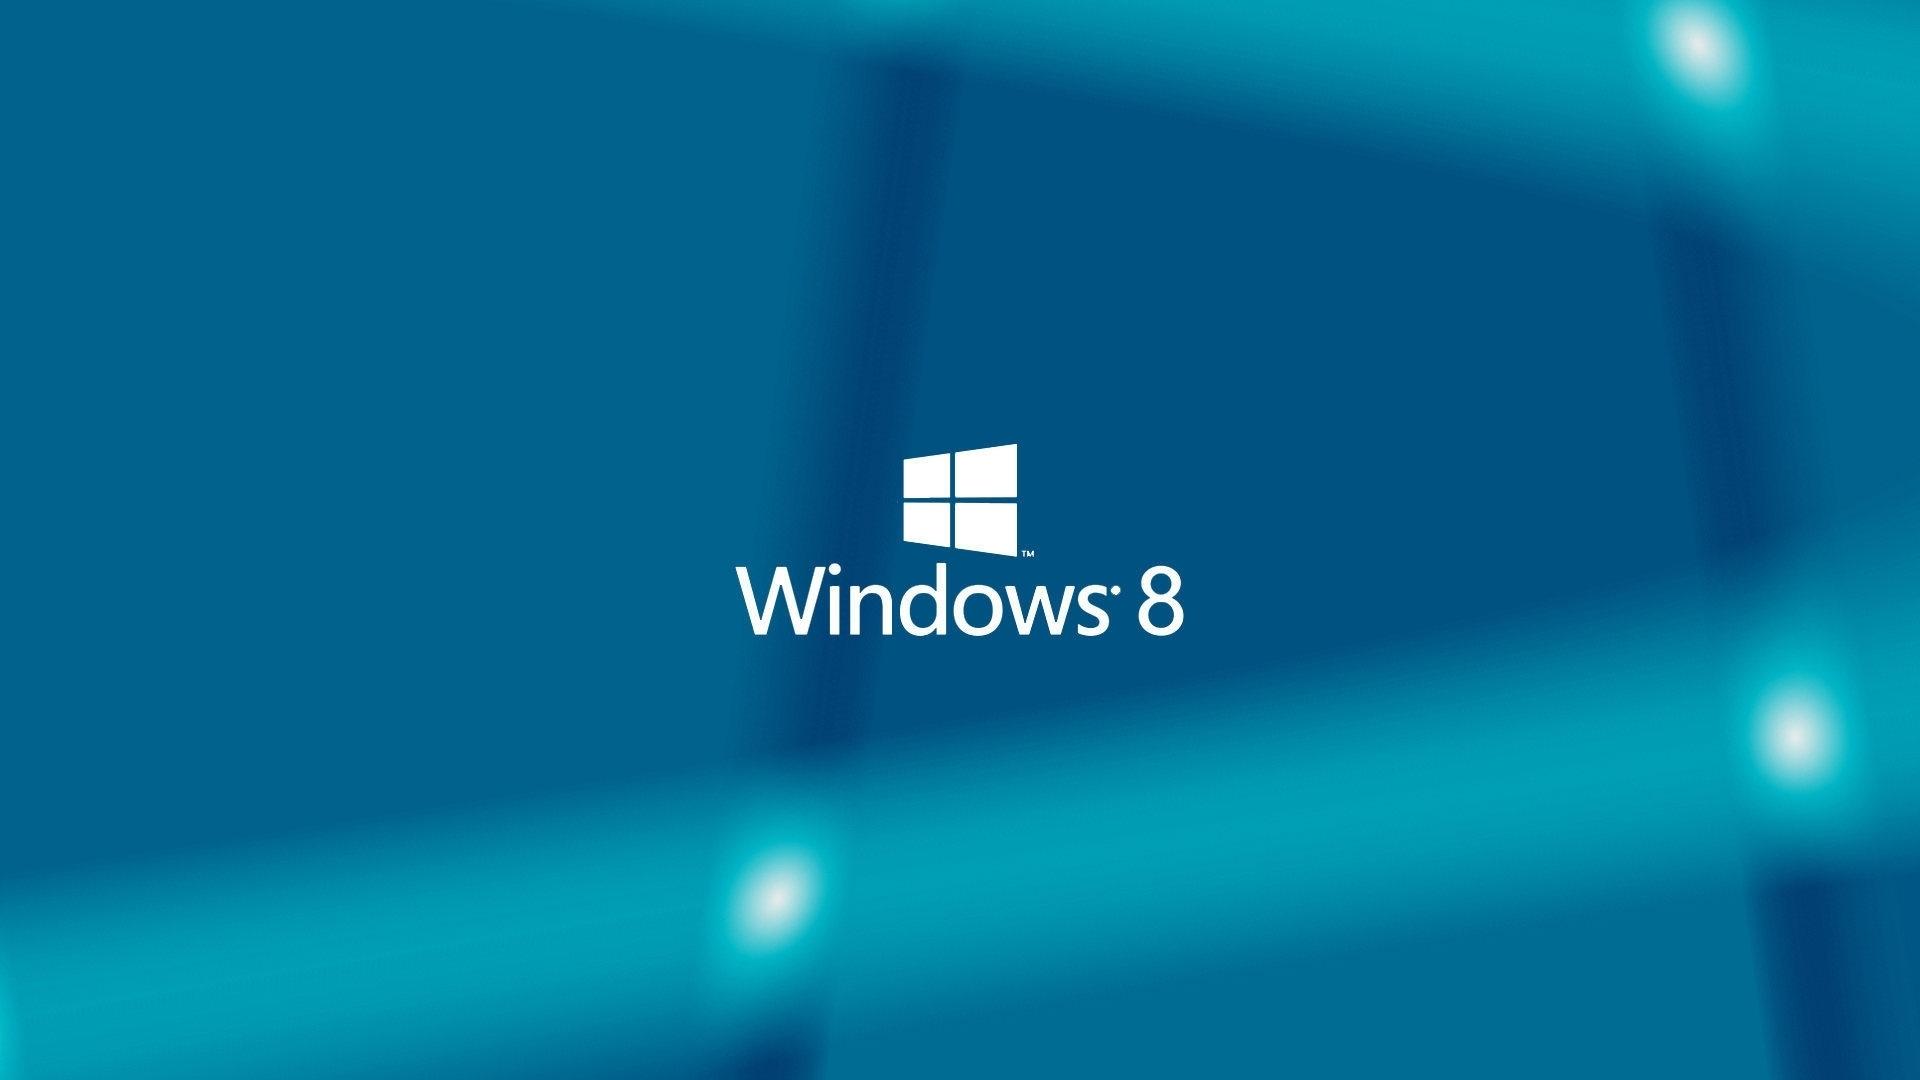 download wallpaper 1920x1080 windows 8, operating system, design